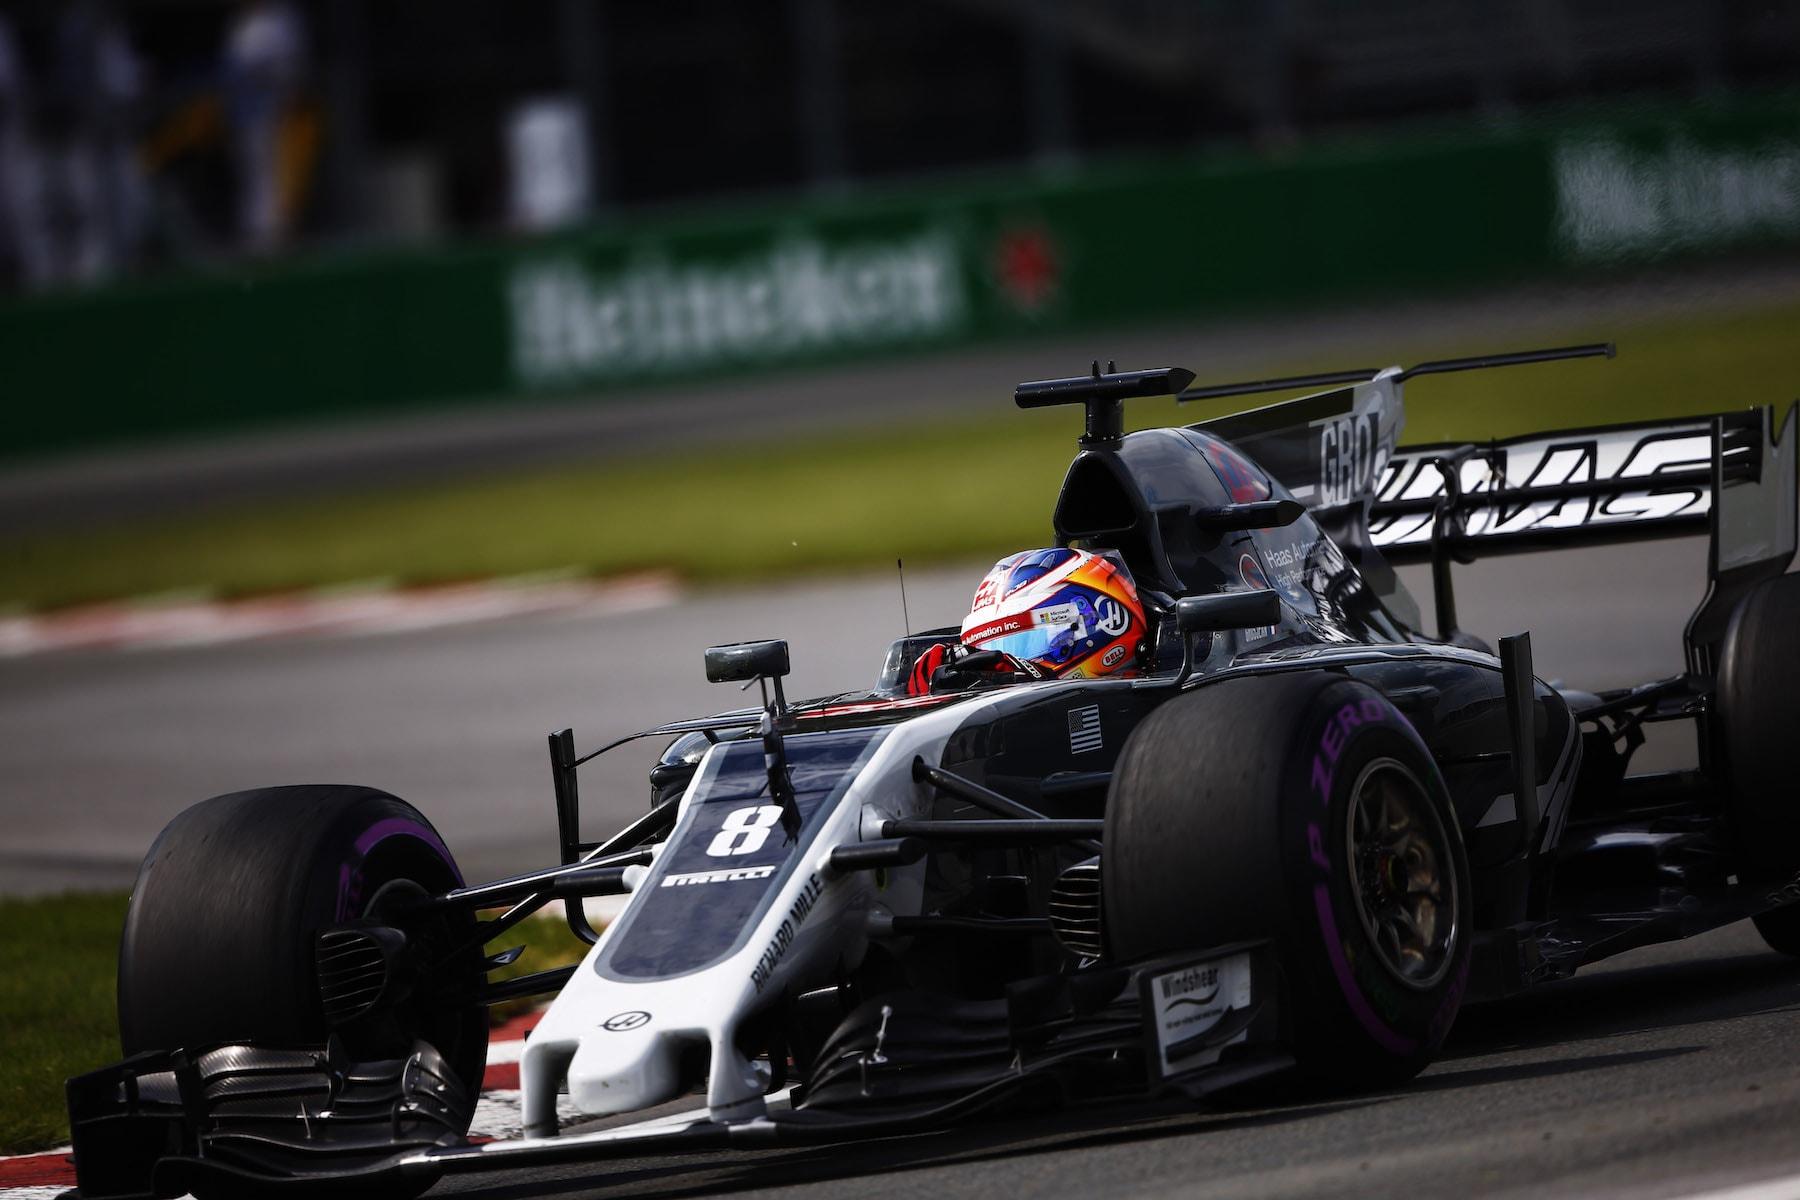 2017 Romain Grosjean | Haas VF17 | 2017 Canadian GP FP2 1 copy.jpg